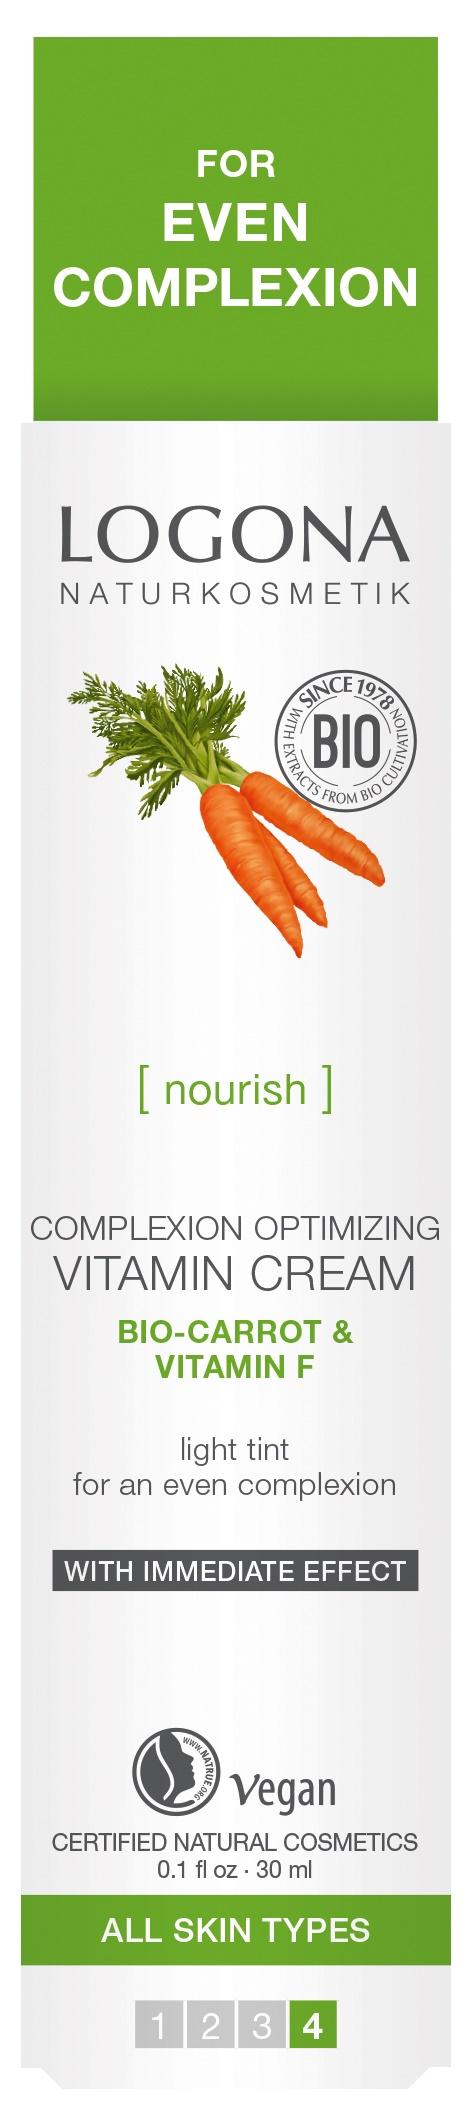 krem a f-vitamin szabadsagaval